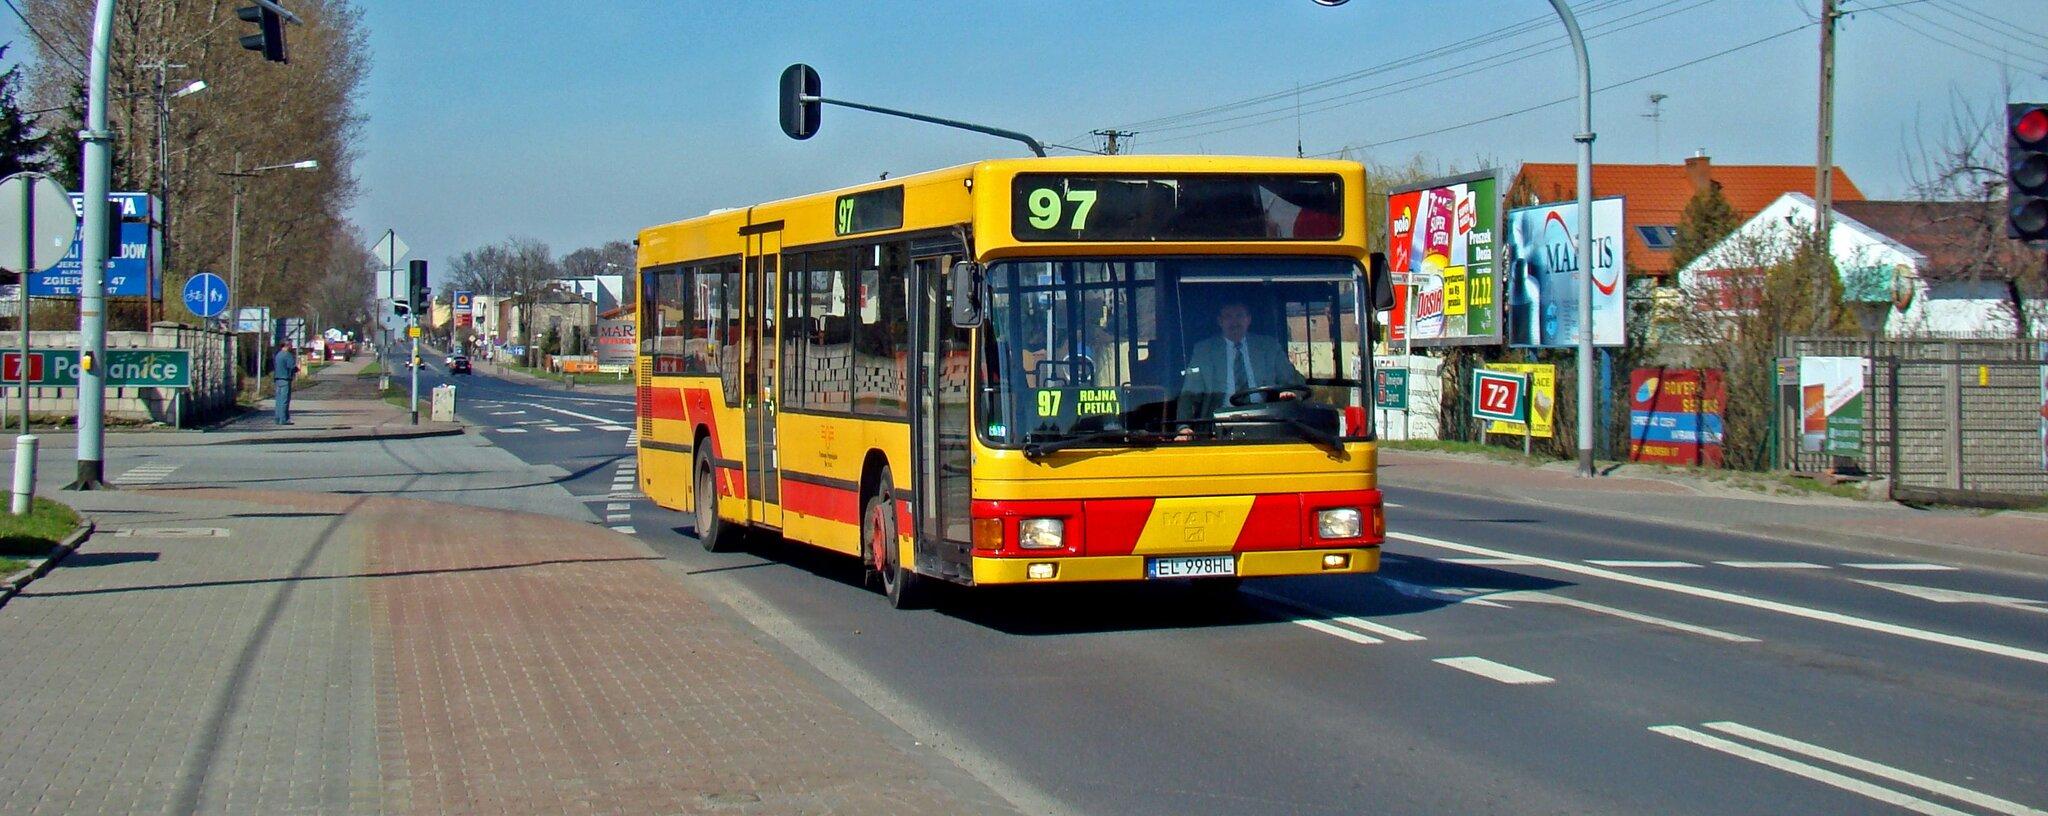 Autobus Źródło: Mateusz War., licencja: CC BY-SA 3.0.